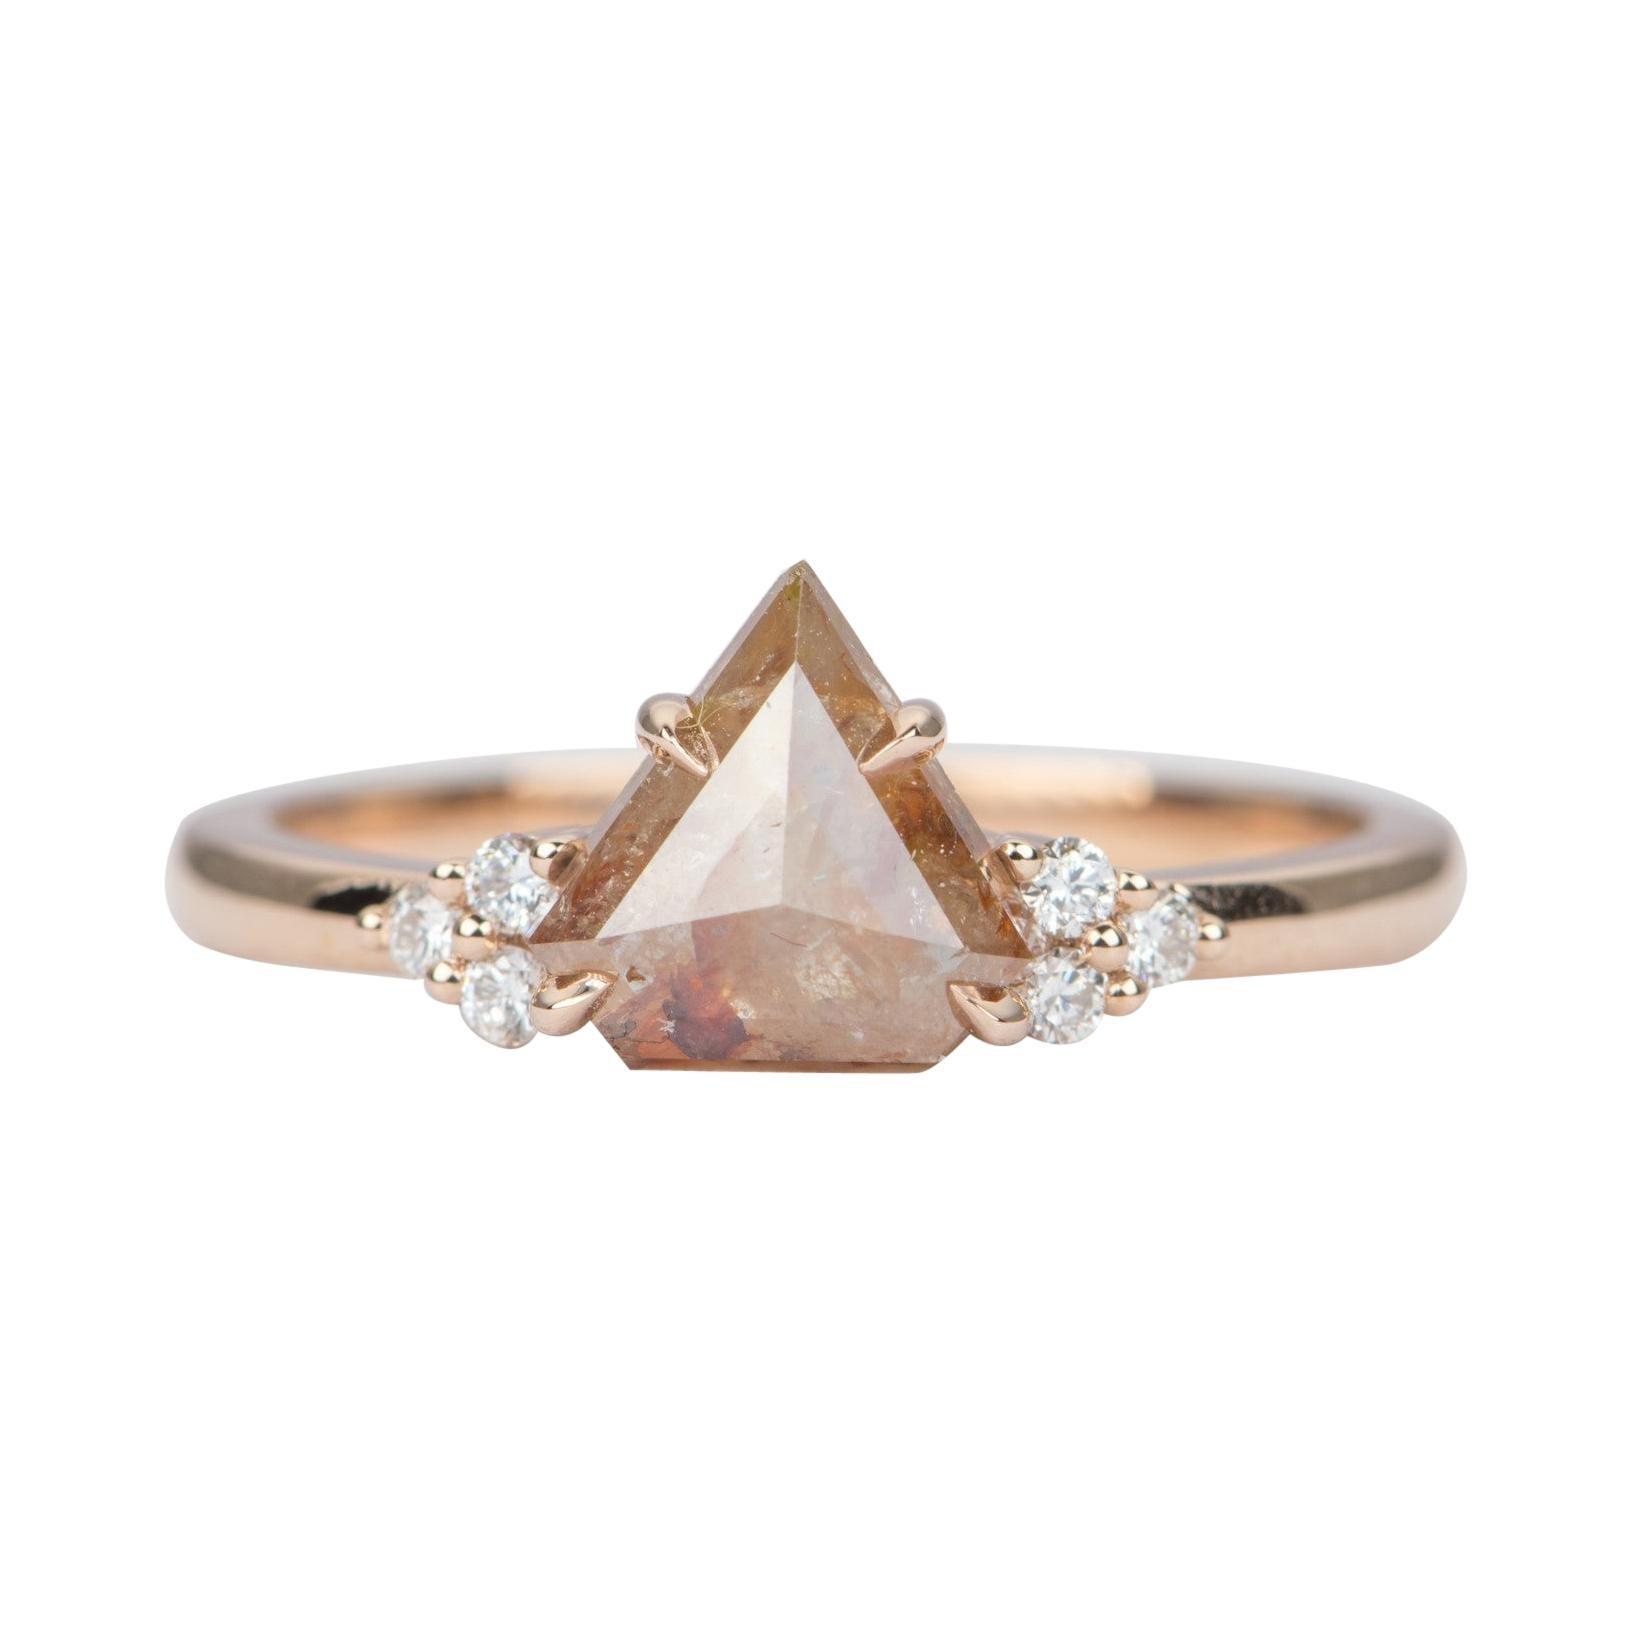 1.22ct Salt and Pepper Diamond 14k Rose Gold Engagement Ring Trio Diamond AD2370